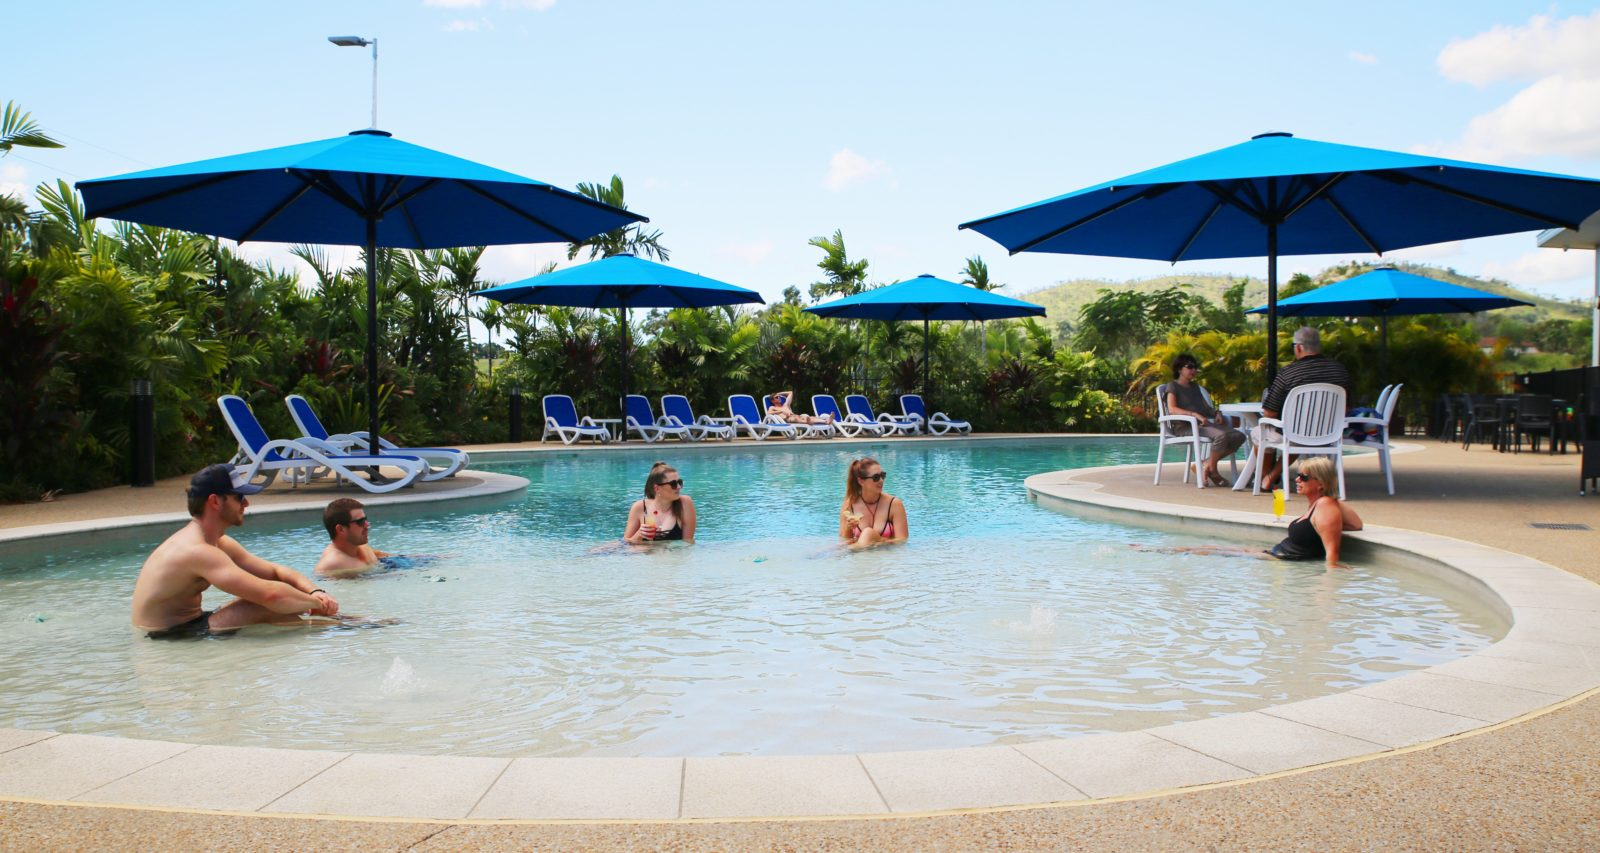 Large resort lagoon pool